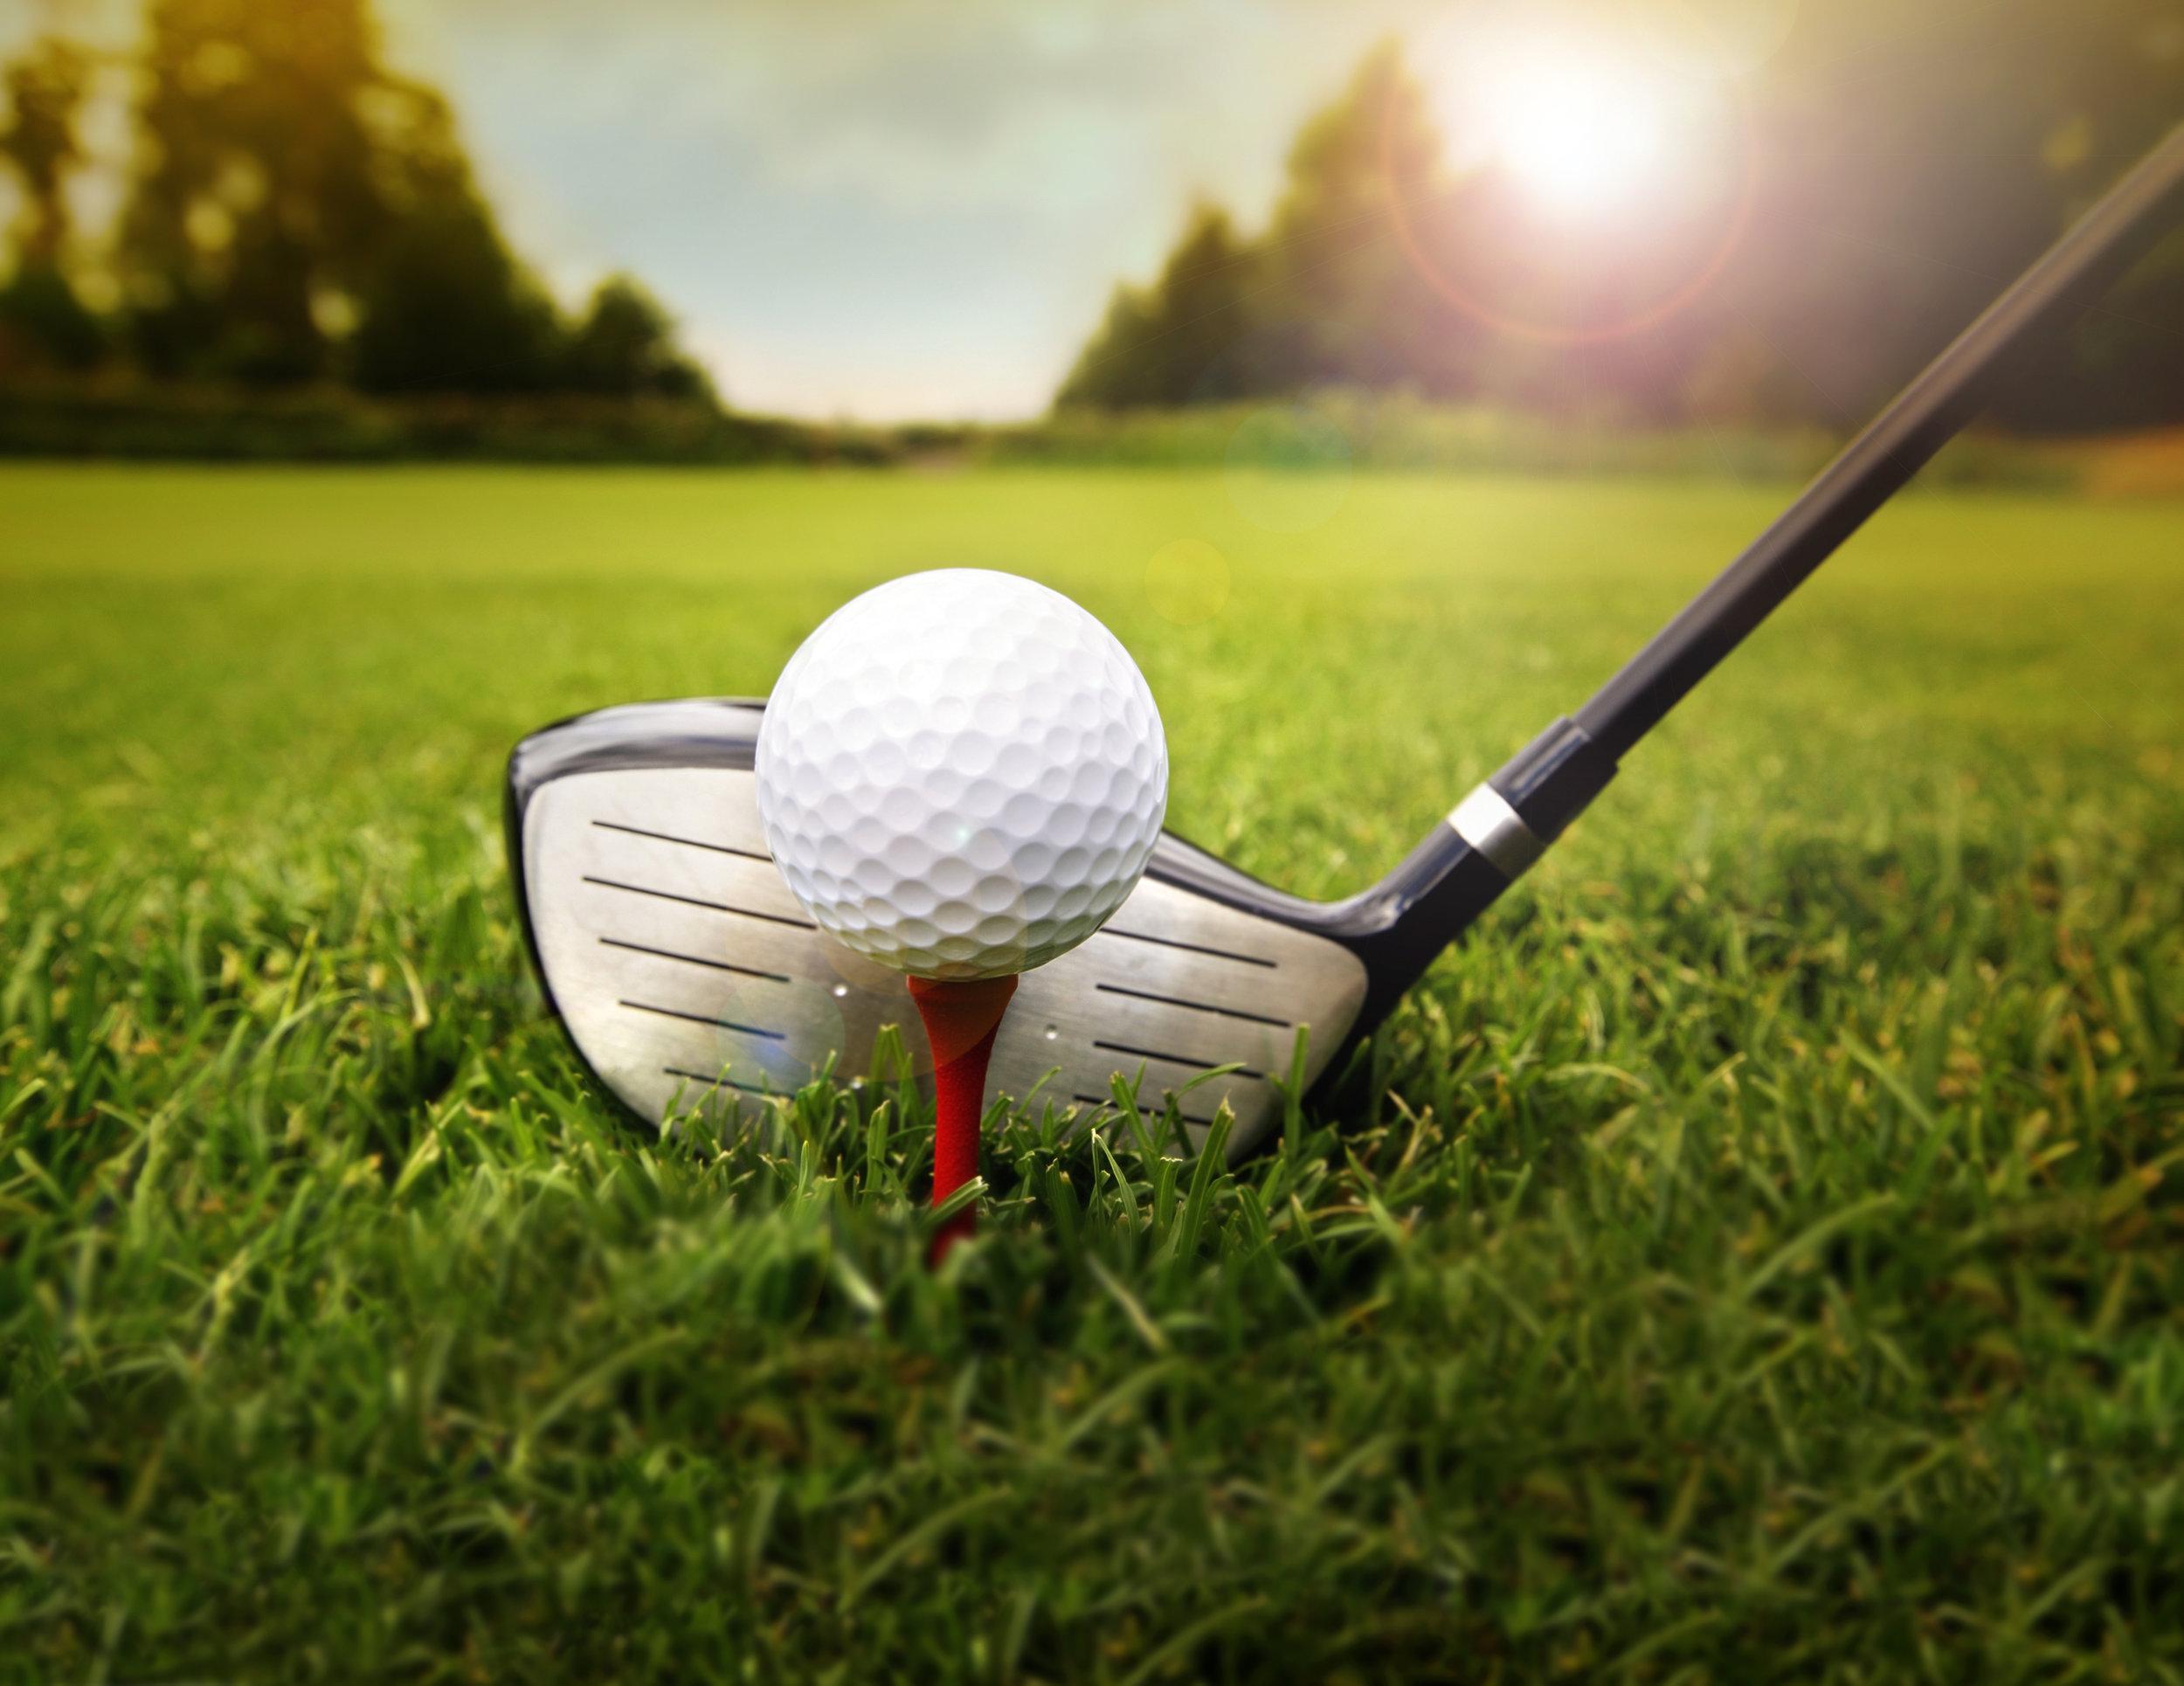 golfkugle og kølle dreamstime_l_34501227.jpg